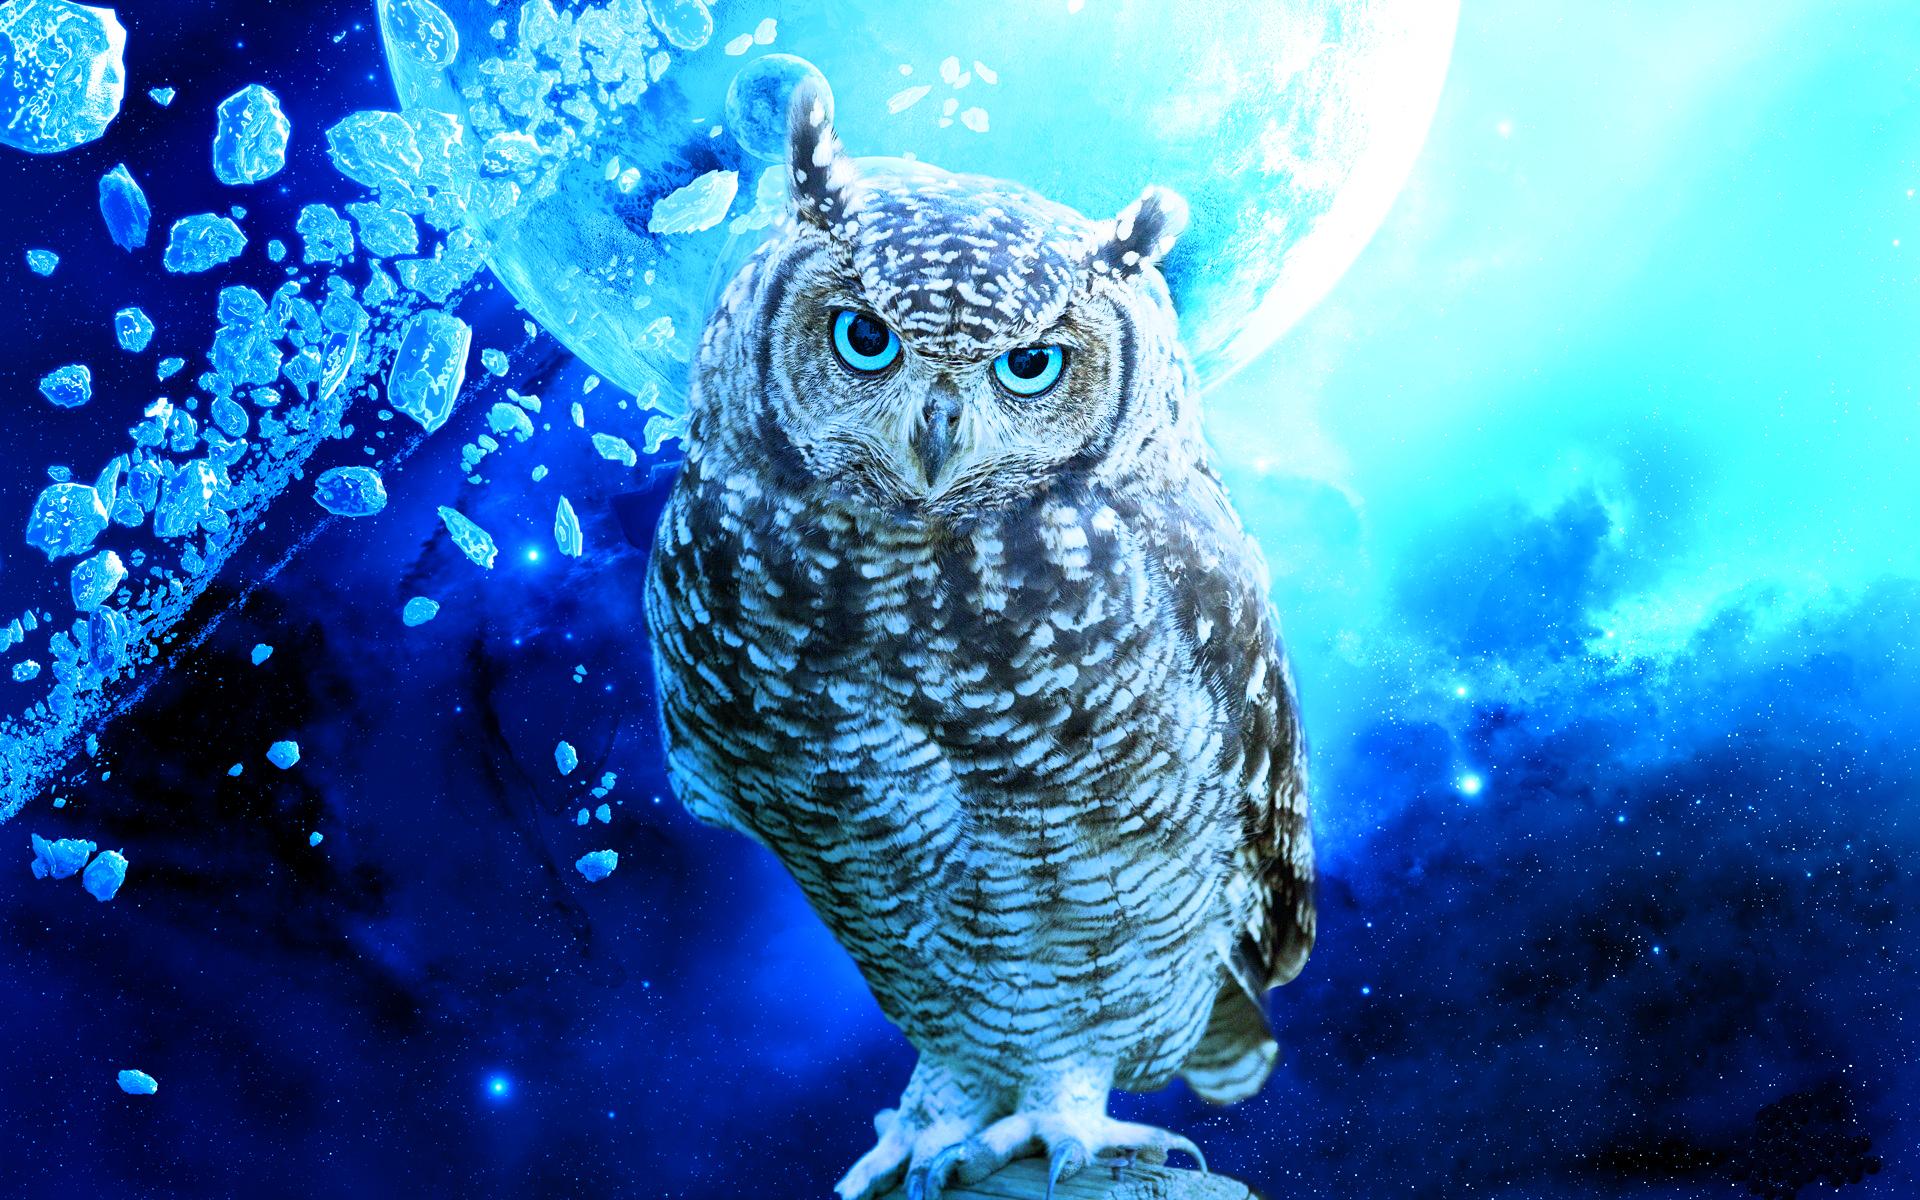 cute owl background wallpapersafari